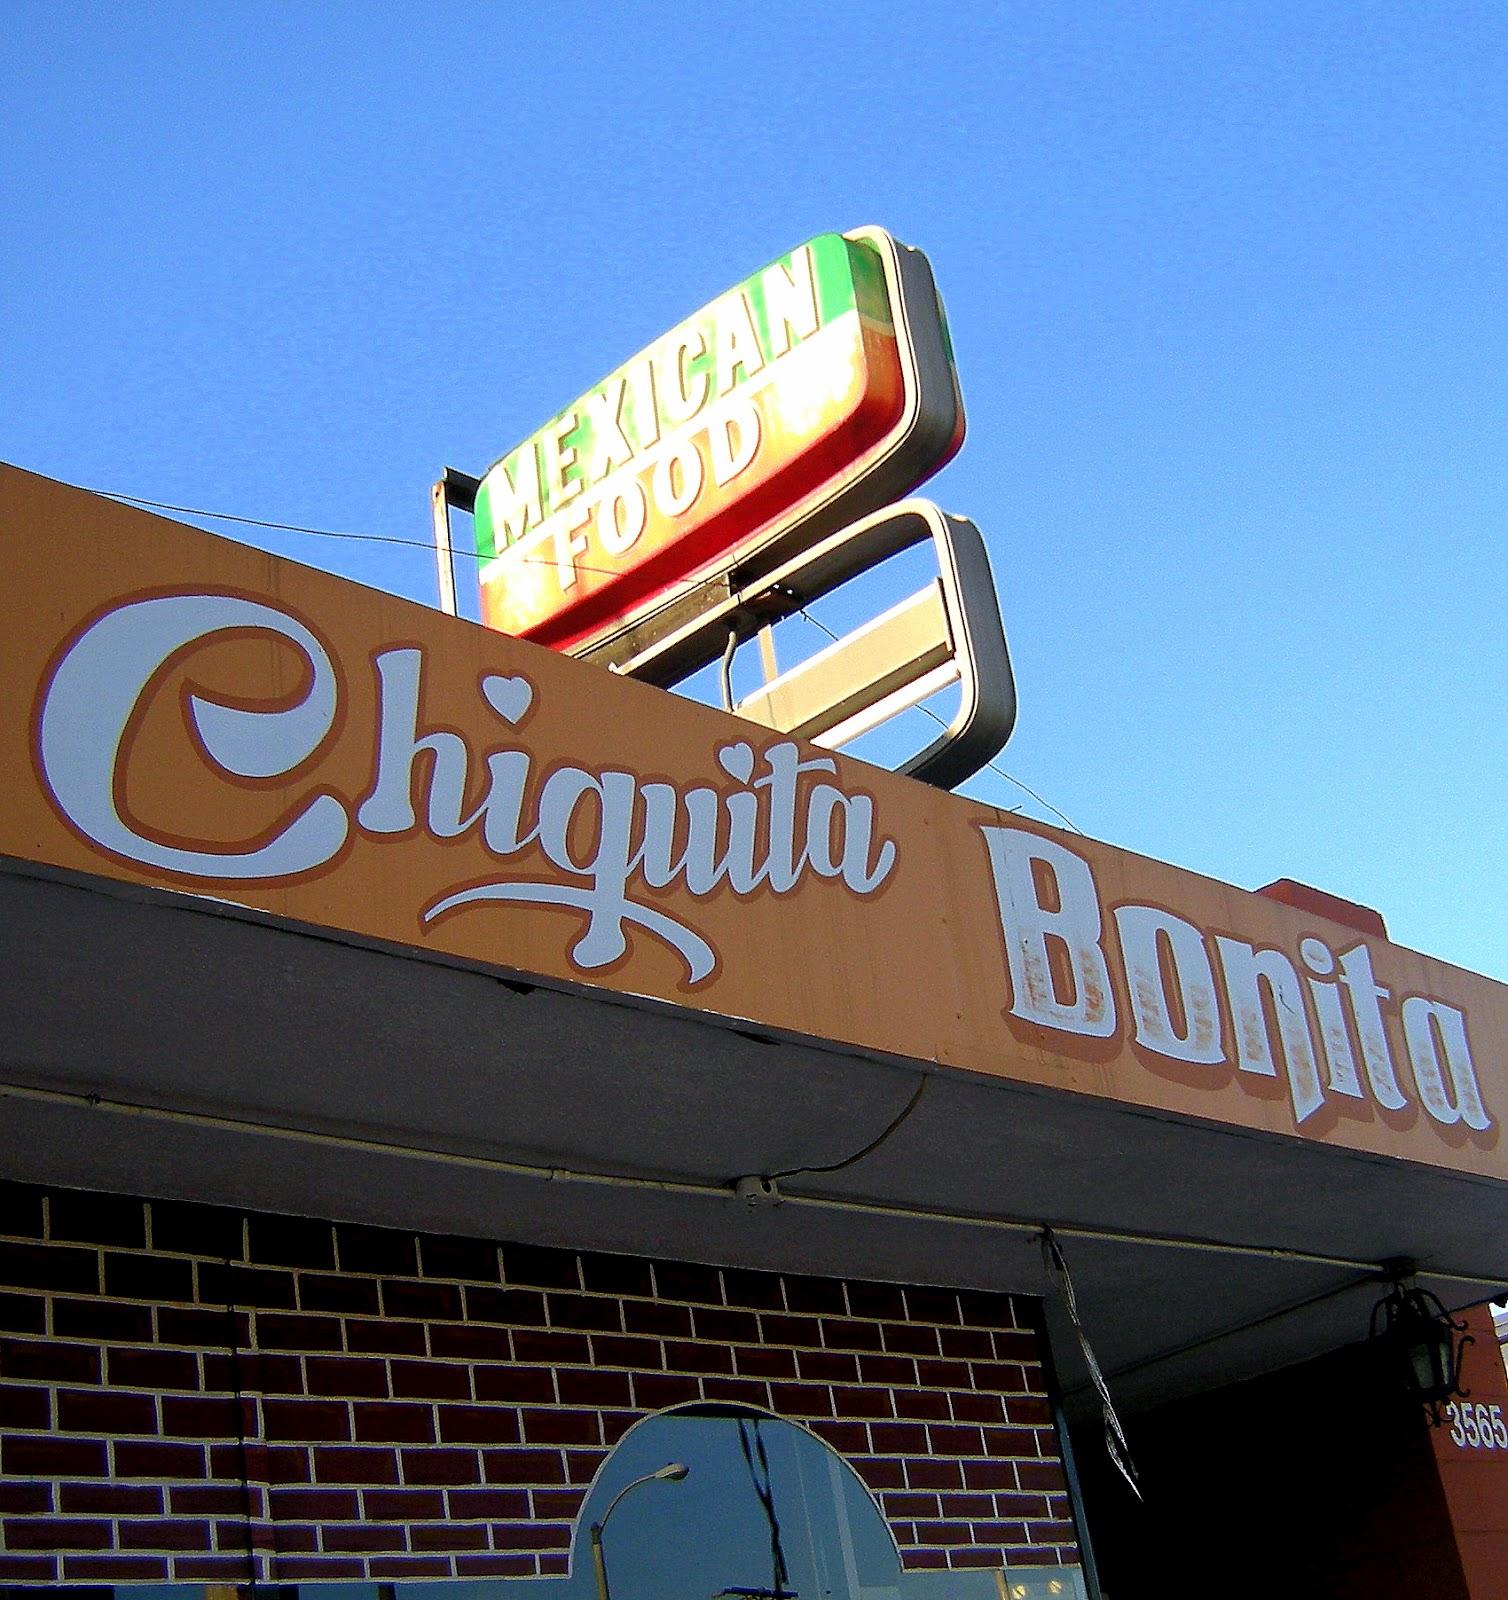 Pasadenapostits Ole Chiquita Bonita